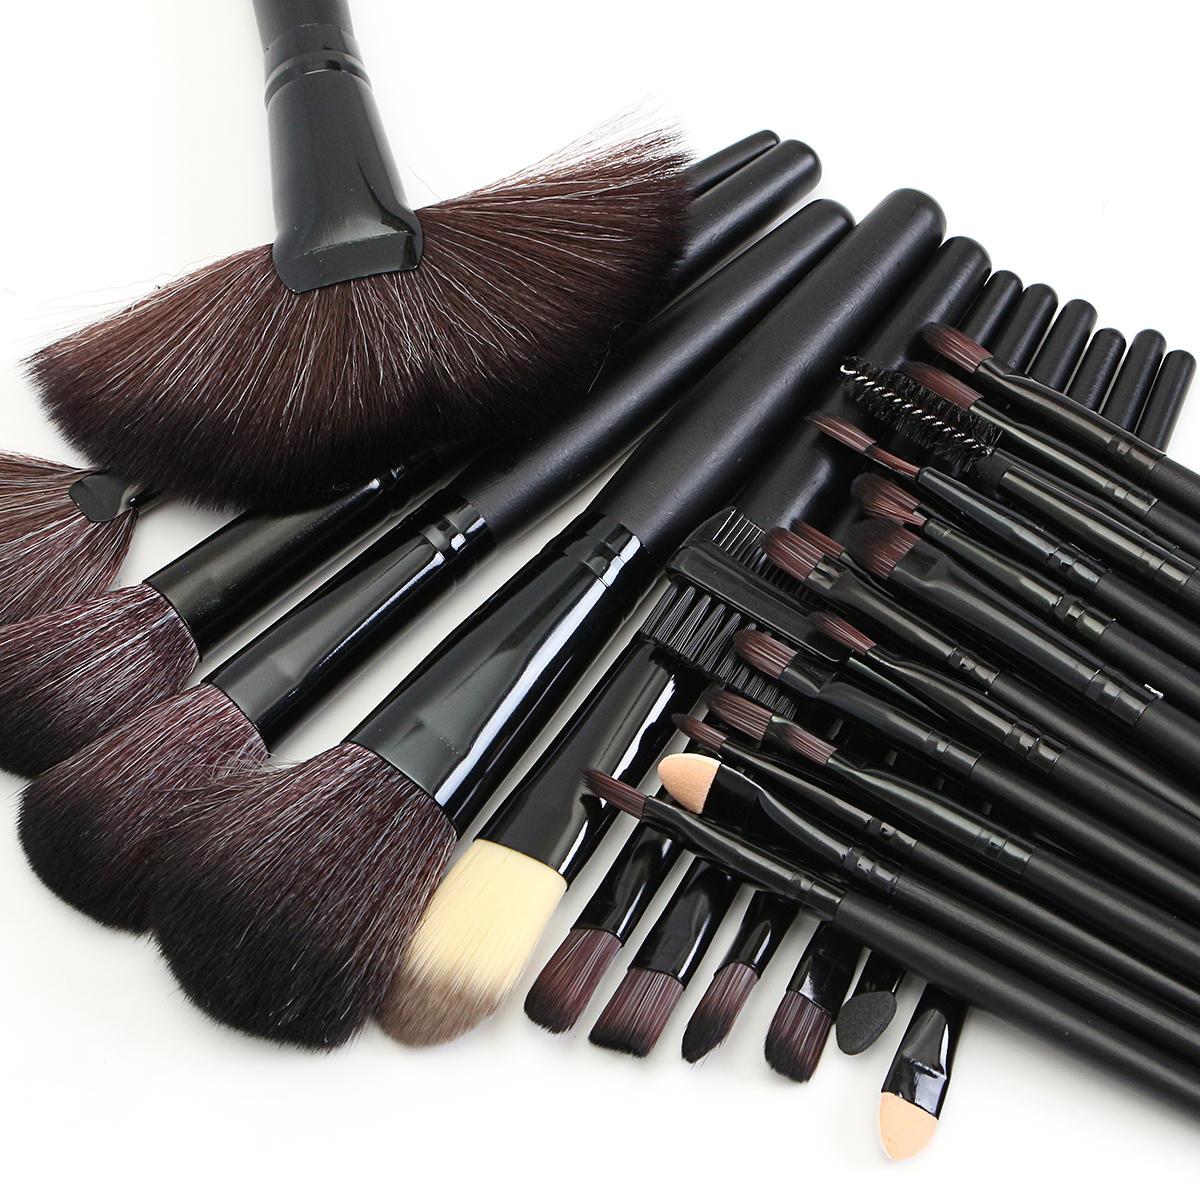 32pcs Pink Eyeshadow Eyebrow Blush Makeup Brushes Cosmetic Tools Set Soft - 9